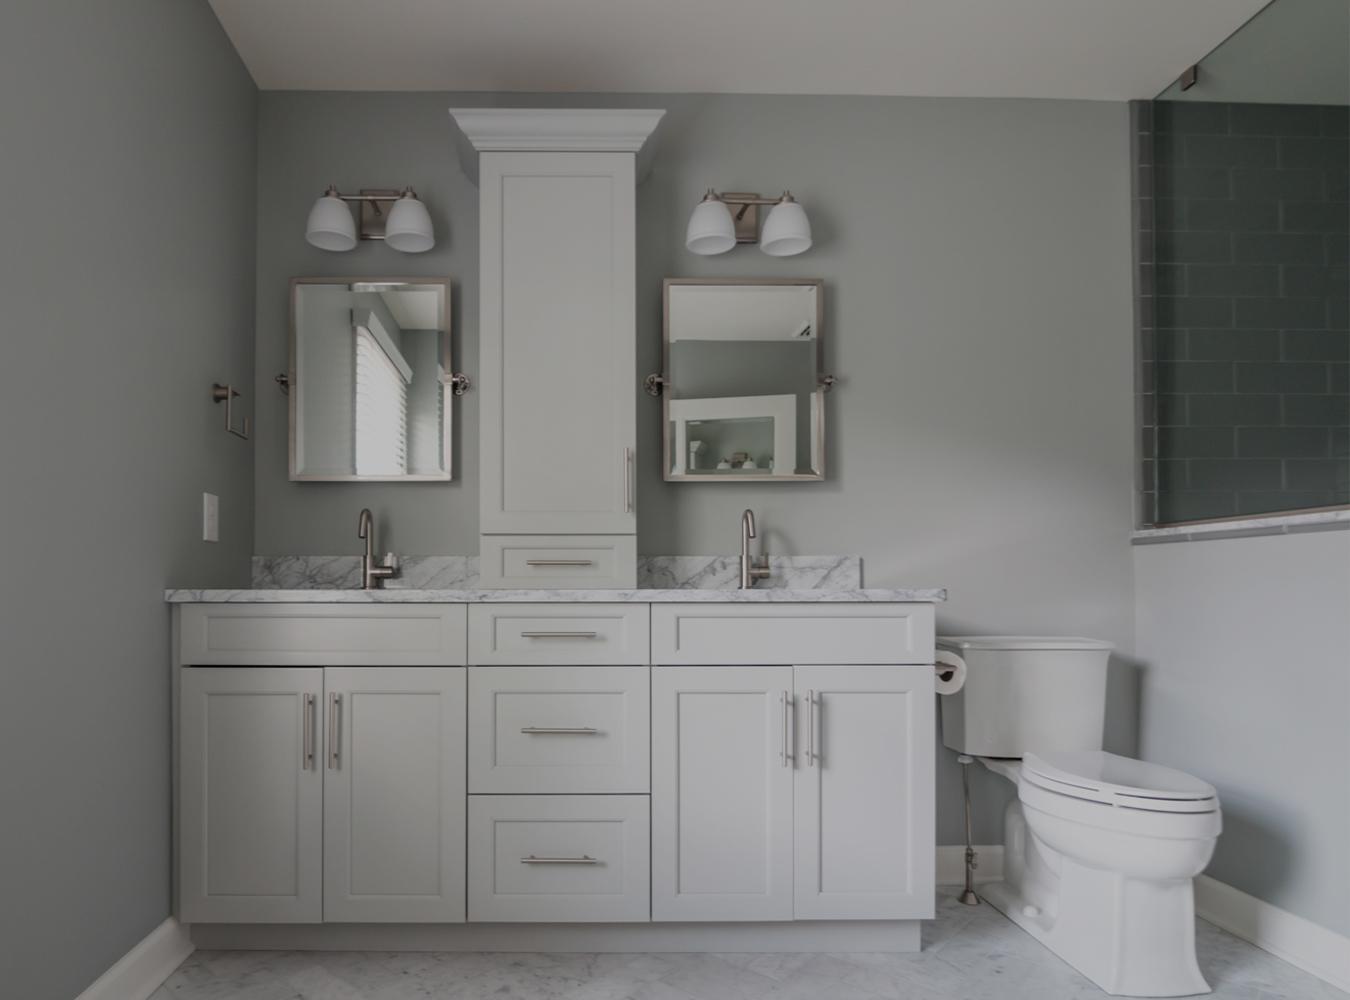 kbdlv kitchens by design Bath design contractor Lehigh Valley PA